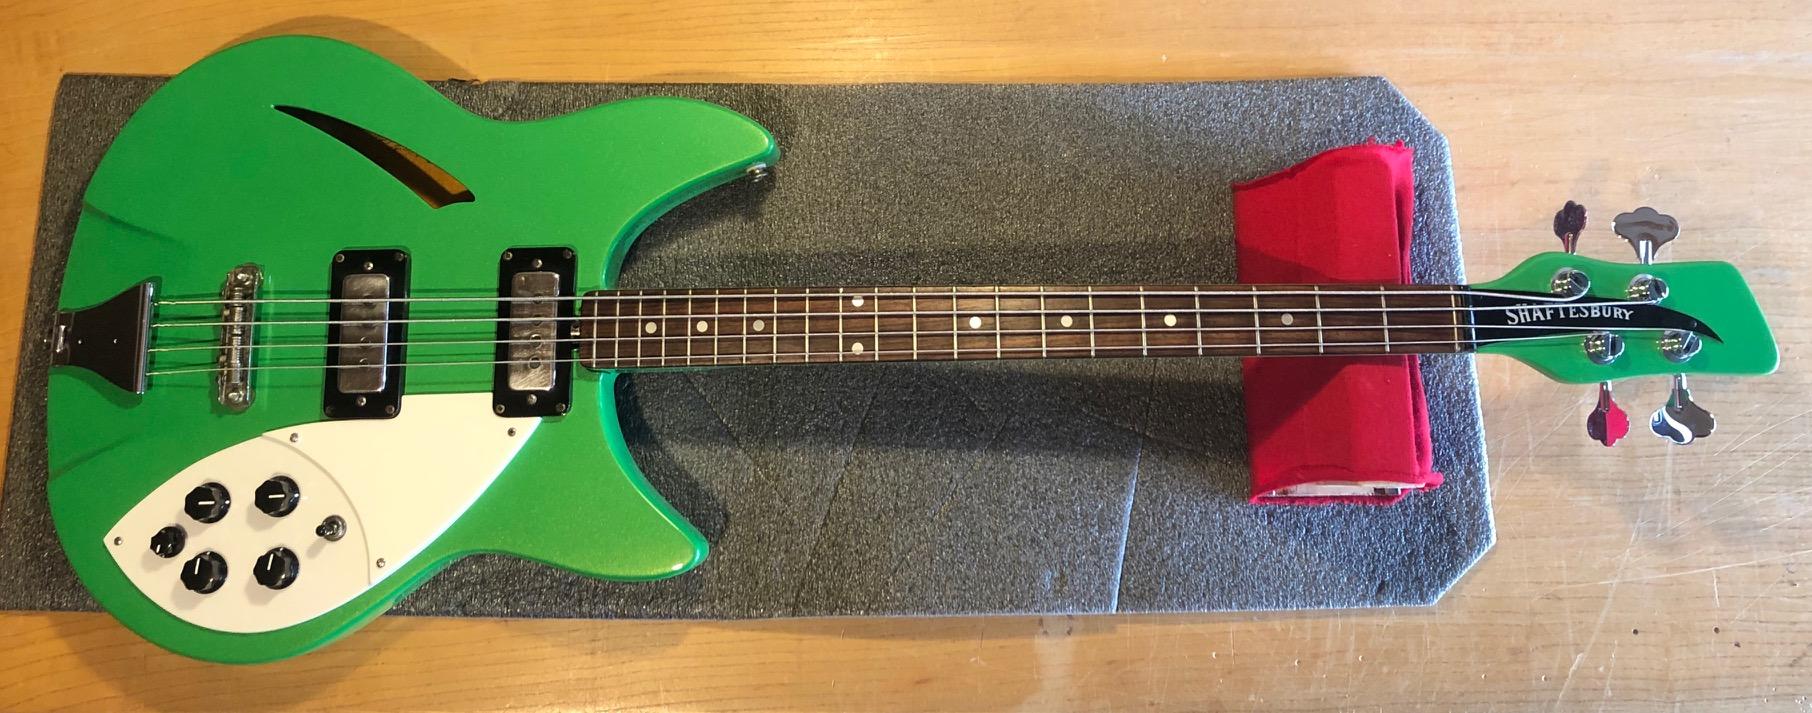 Shaftesbury Guitar 1969